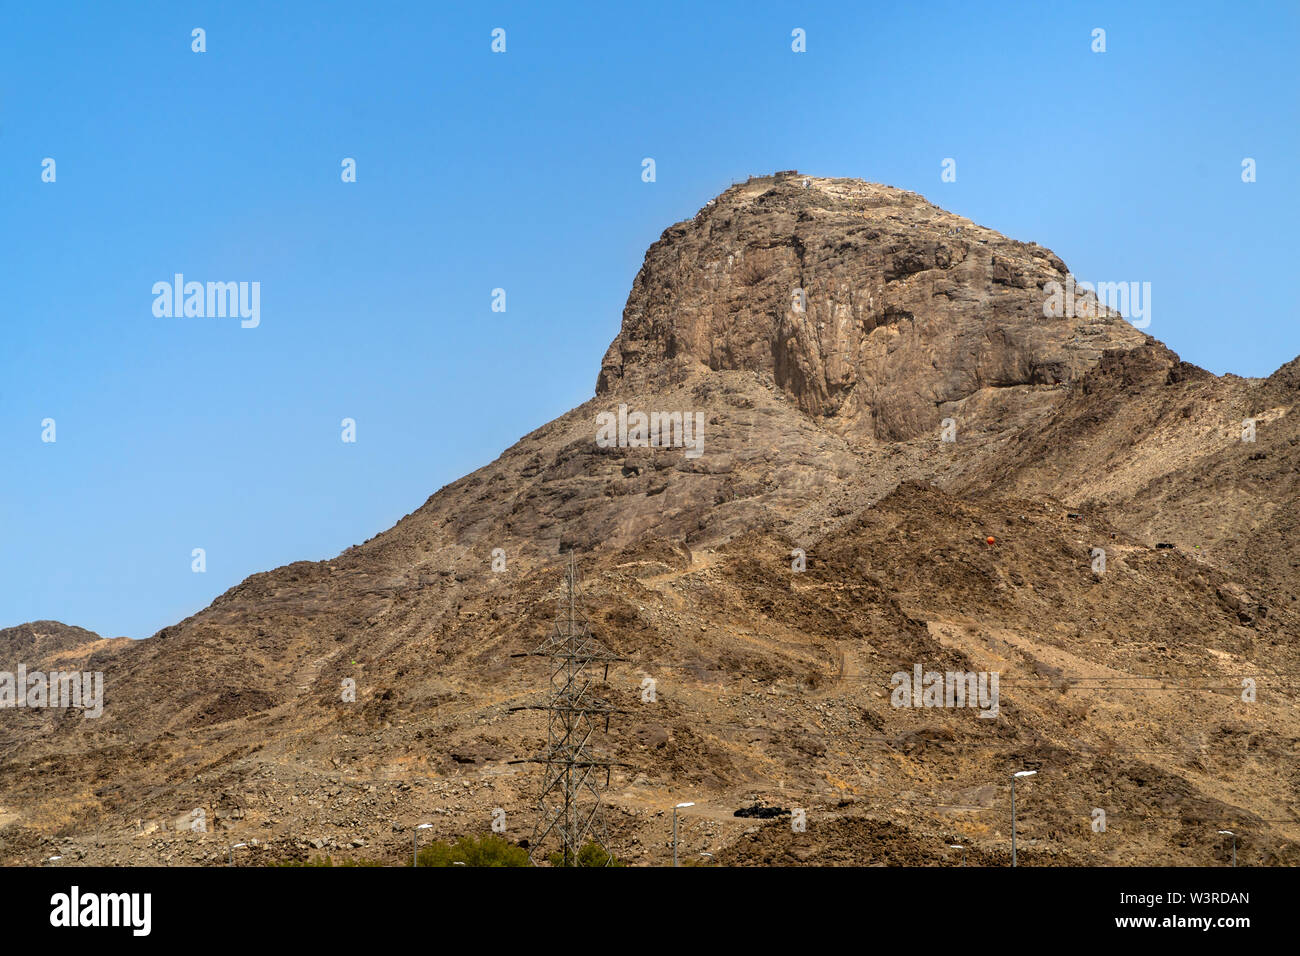 Jabal Nour (Nour Mountain) in Mecca, Saudi Arabia  Prophet